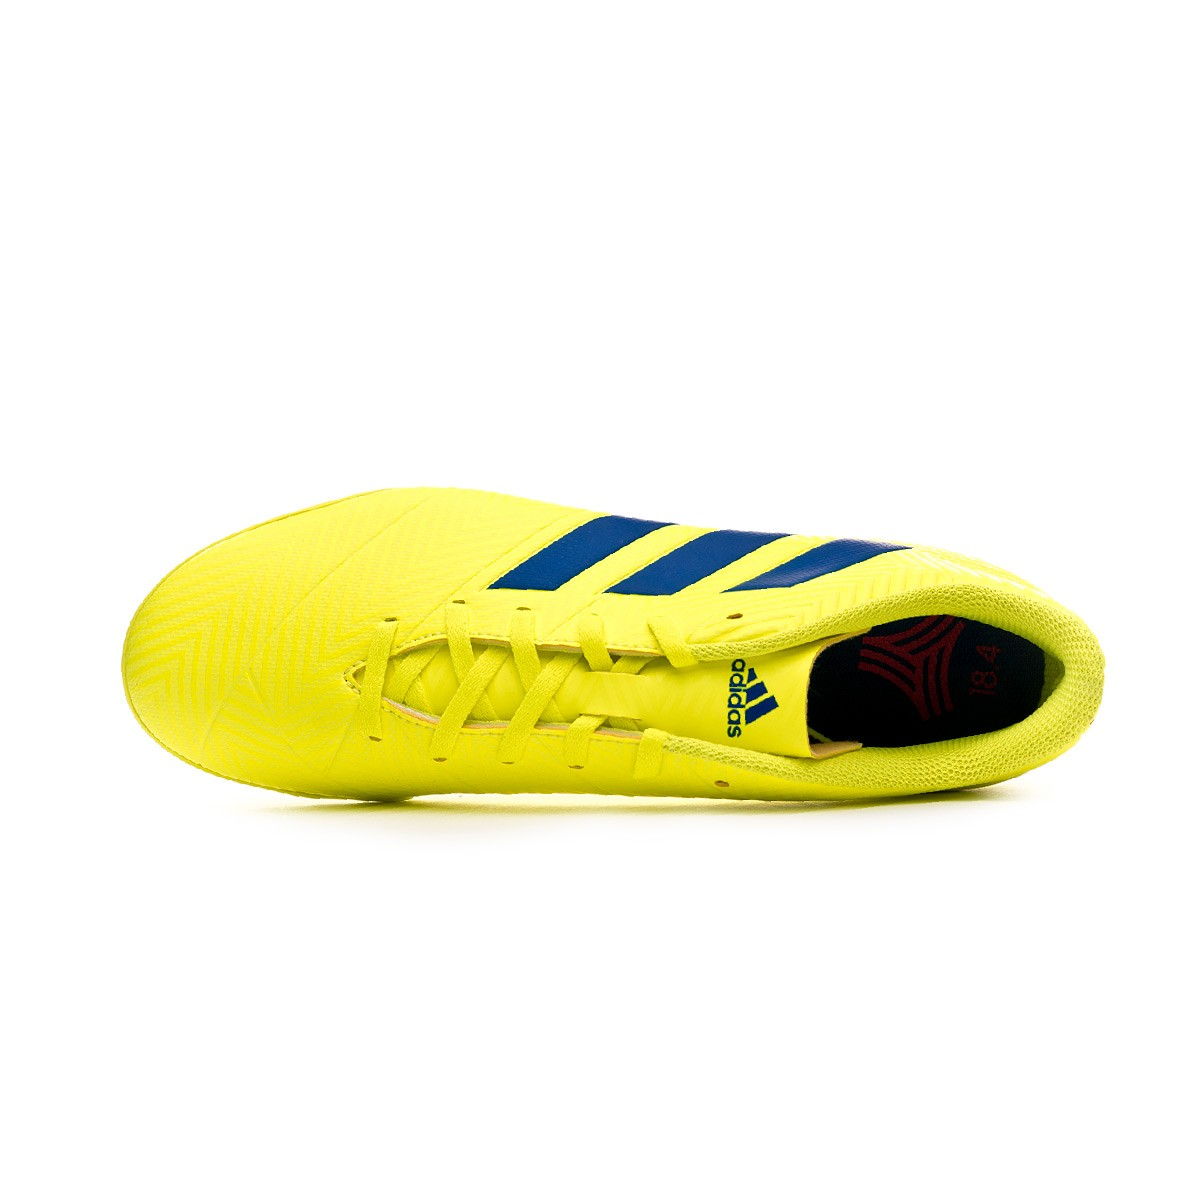 Chaussure de football adidas Nemeziz Tango 18.4 Turf